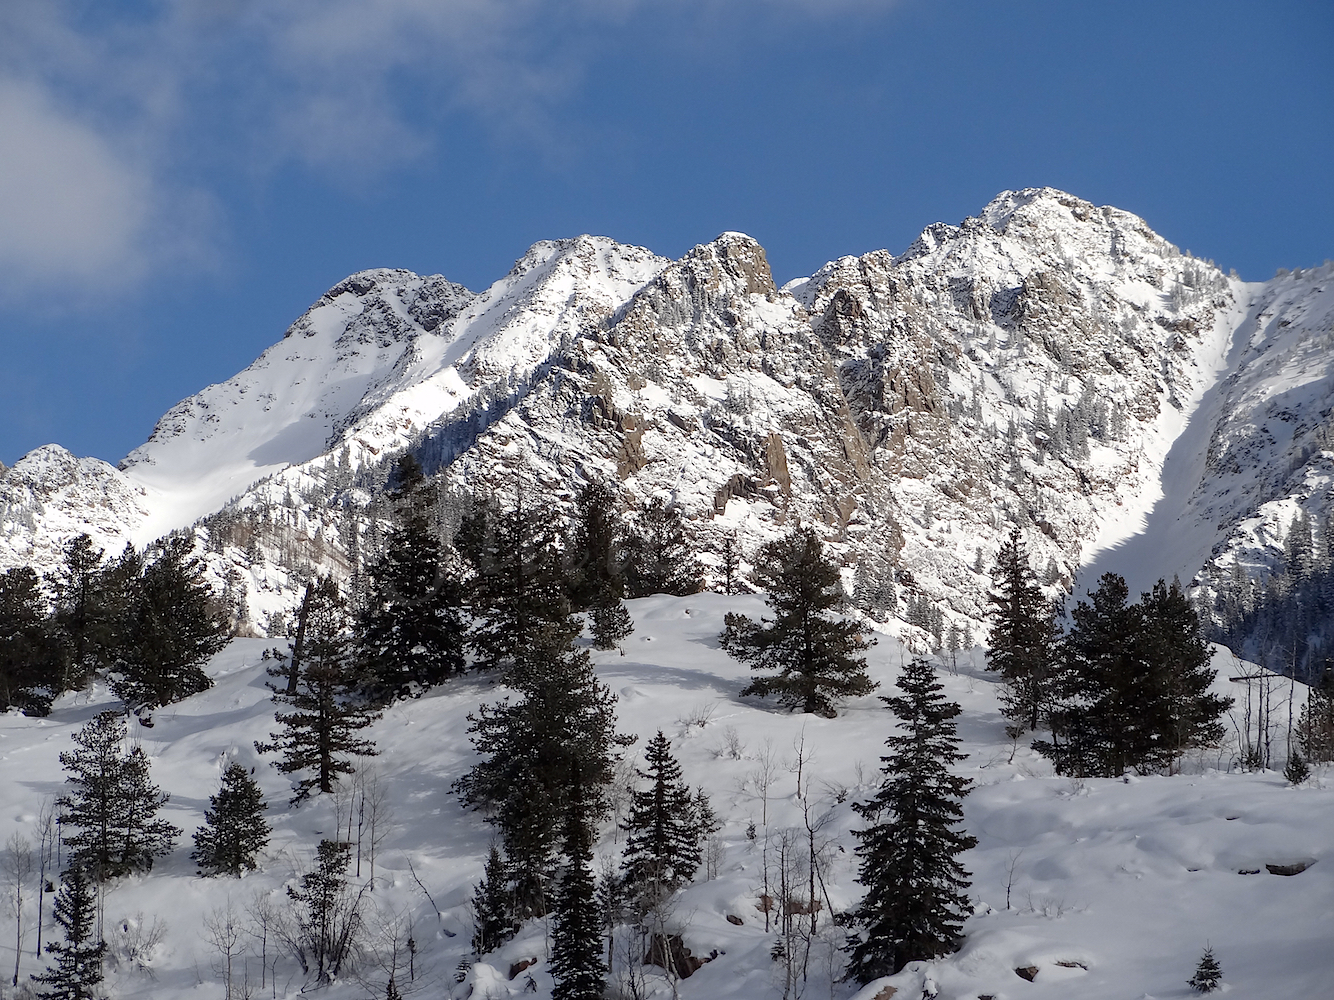 Lime Creek Road Snowshoe, Image #5384